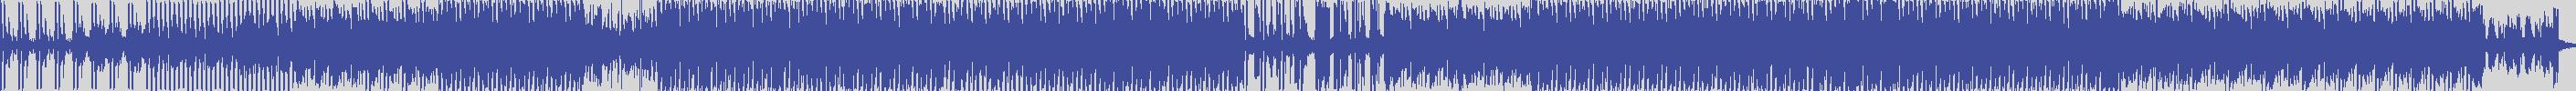 worldwide_music_records [WMR002] Difetti Sonori - Sweat [Original Mix] audio wave form